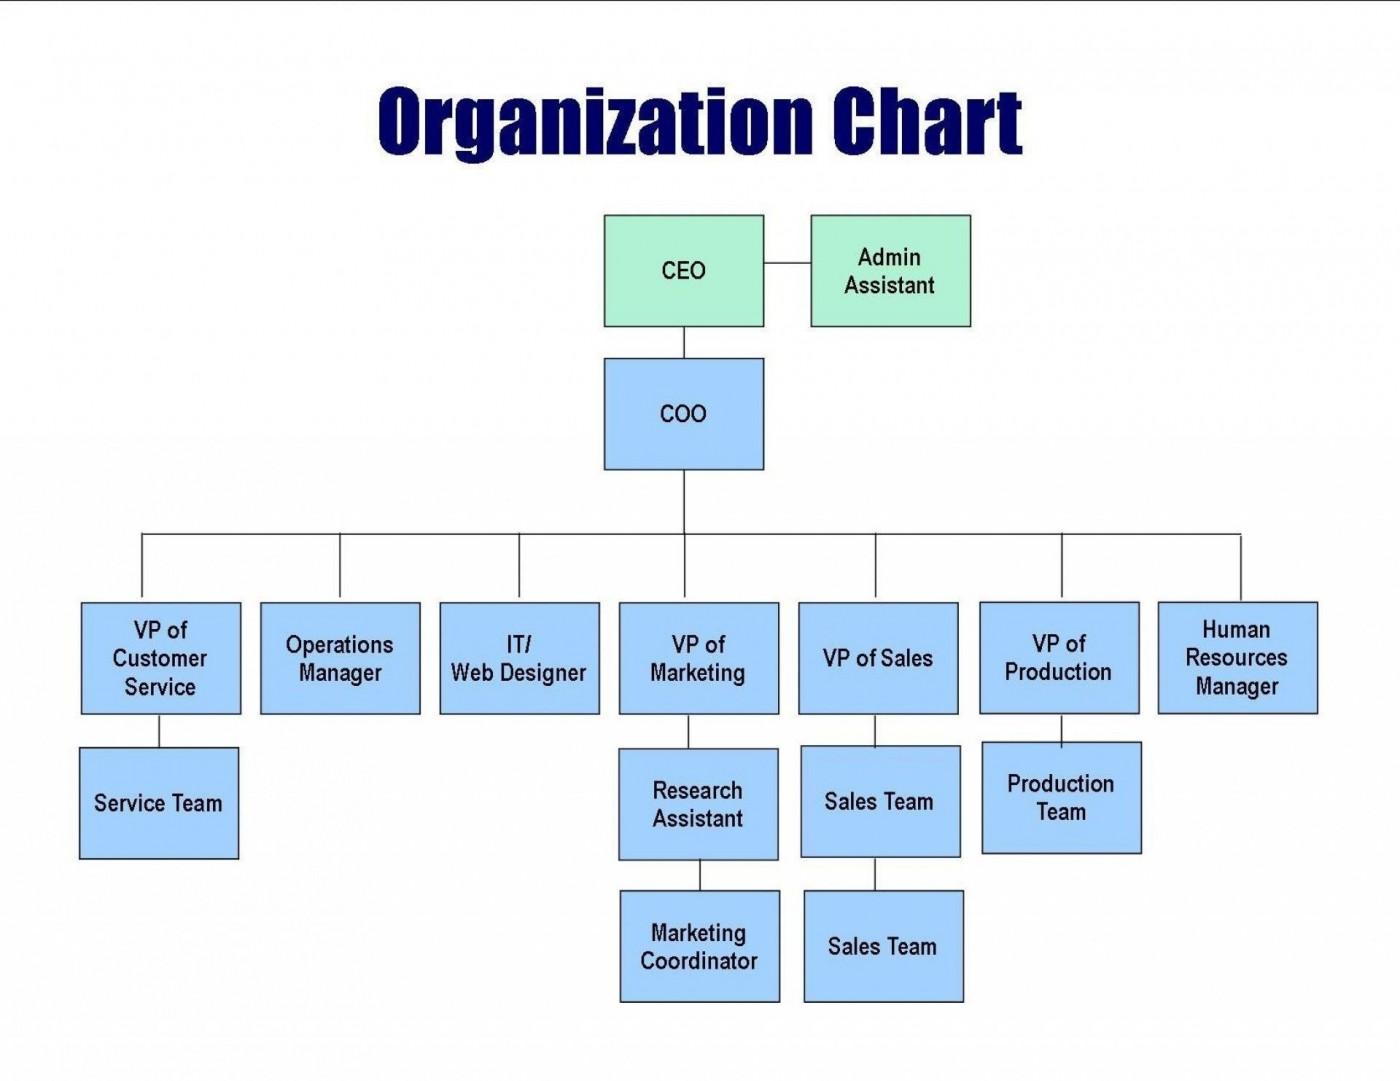 009 Unbelievable Organization Chart Template Word 2013 Photo  Organizational Free Microsoft1400